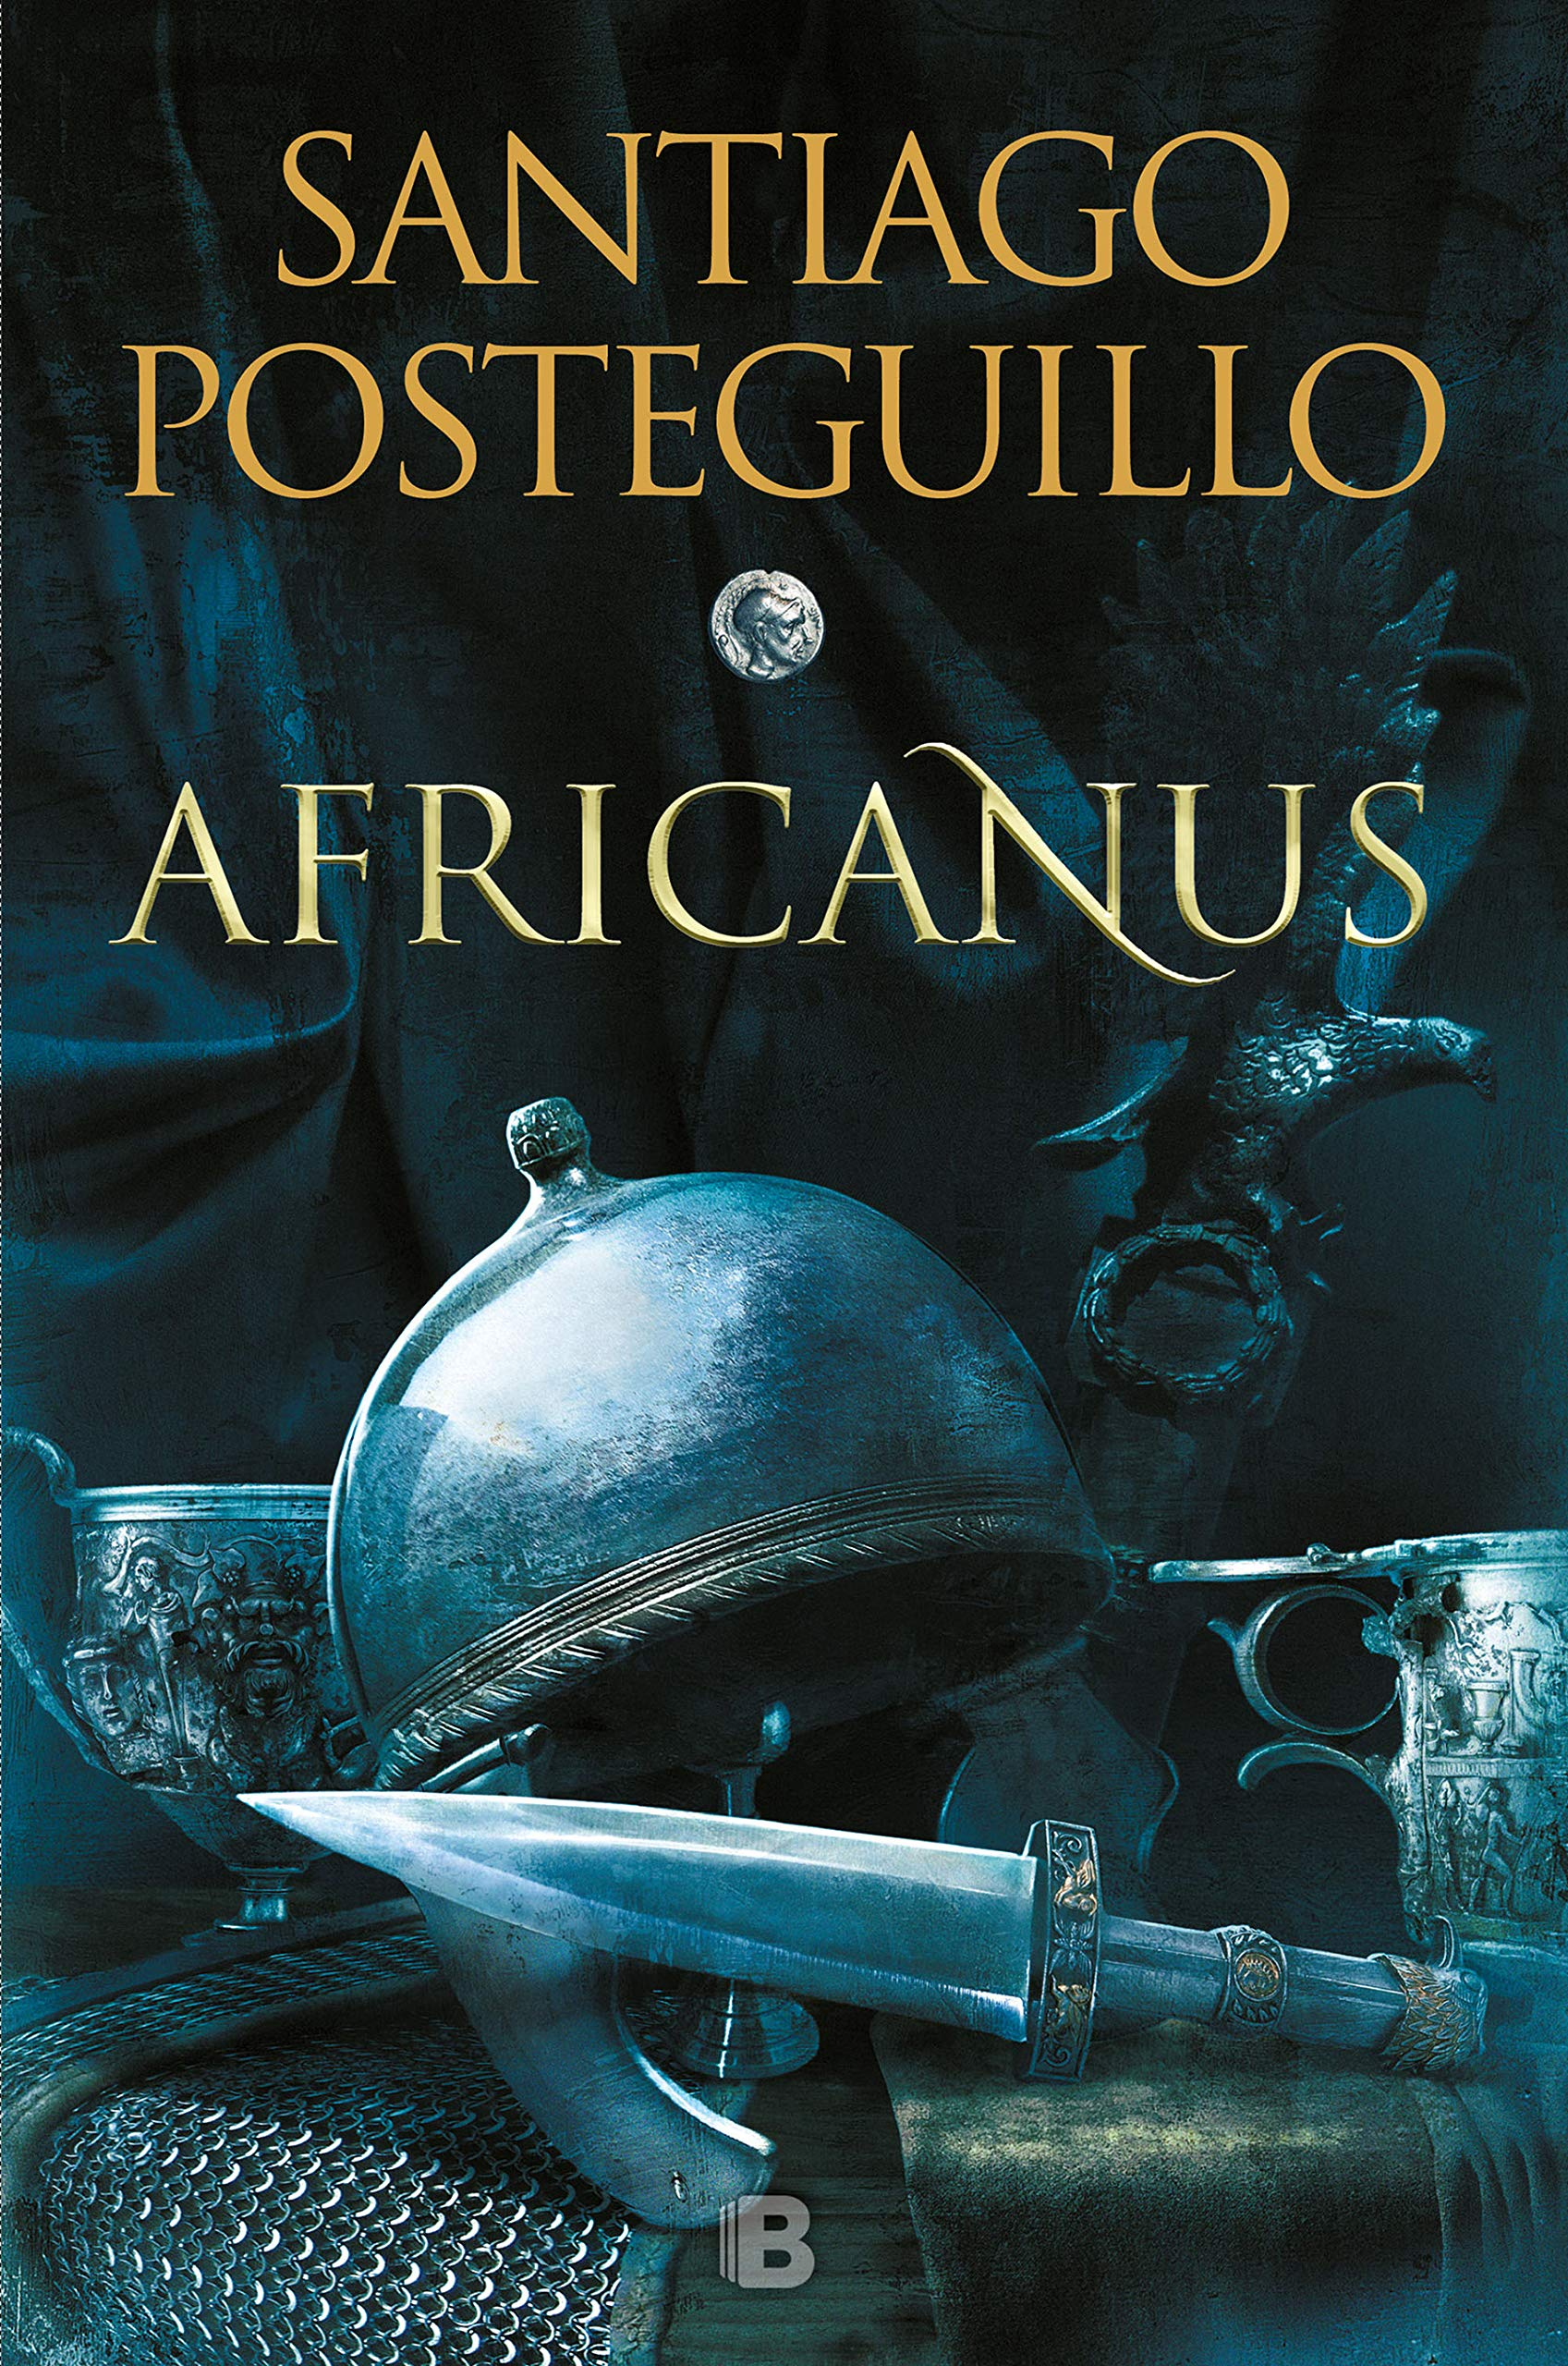 mejores libros de Santiago Posteguillo - Africanus